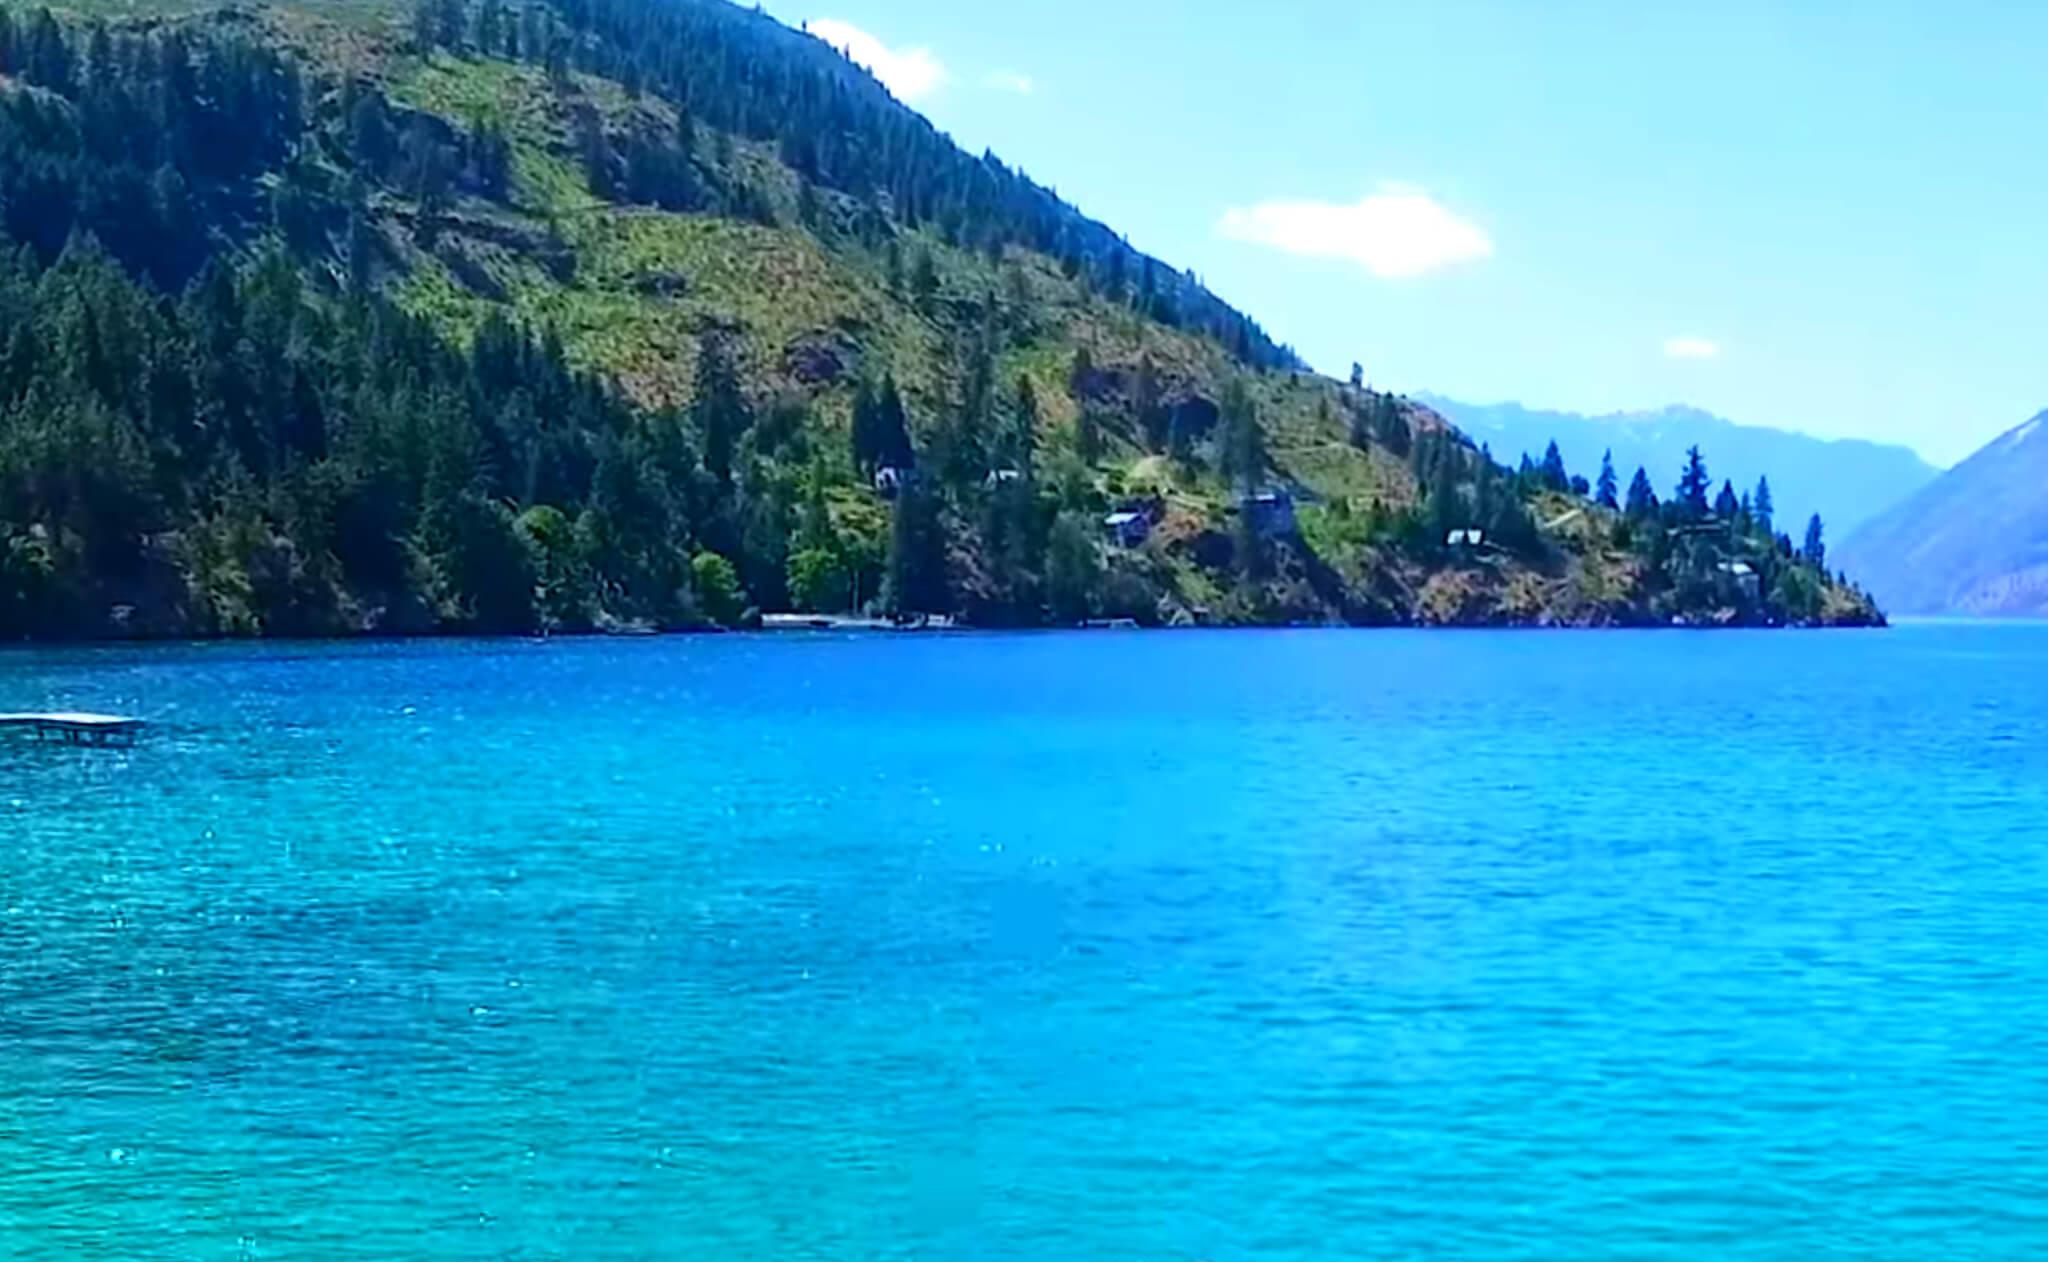 Chelan-Lake-Fishing-Report-Guide-Washington-04